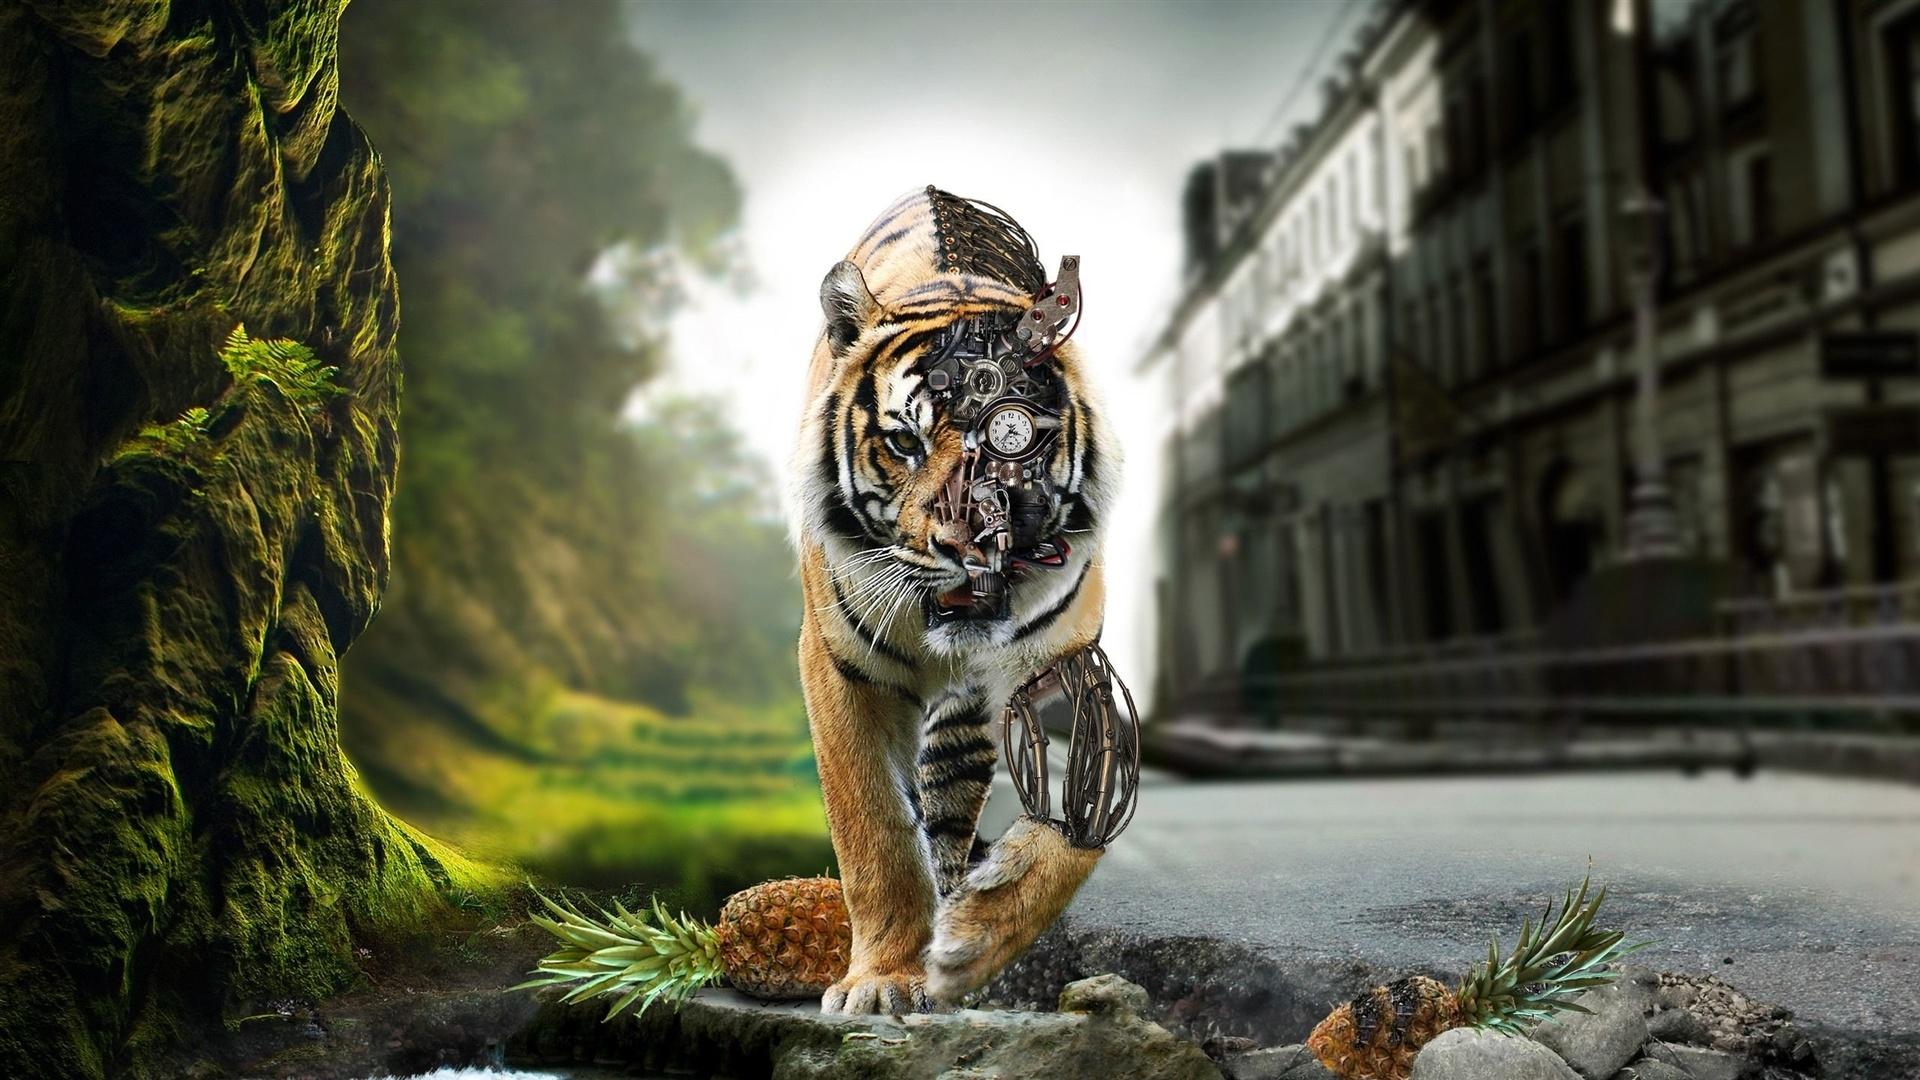 Download Wallpaper 1920x1080 Tiger Robot Full HD Background